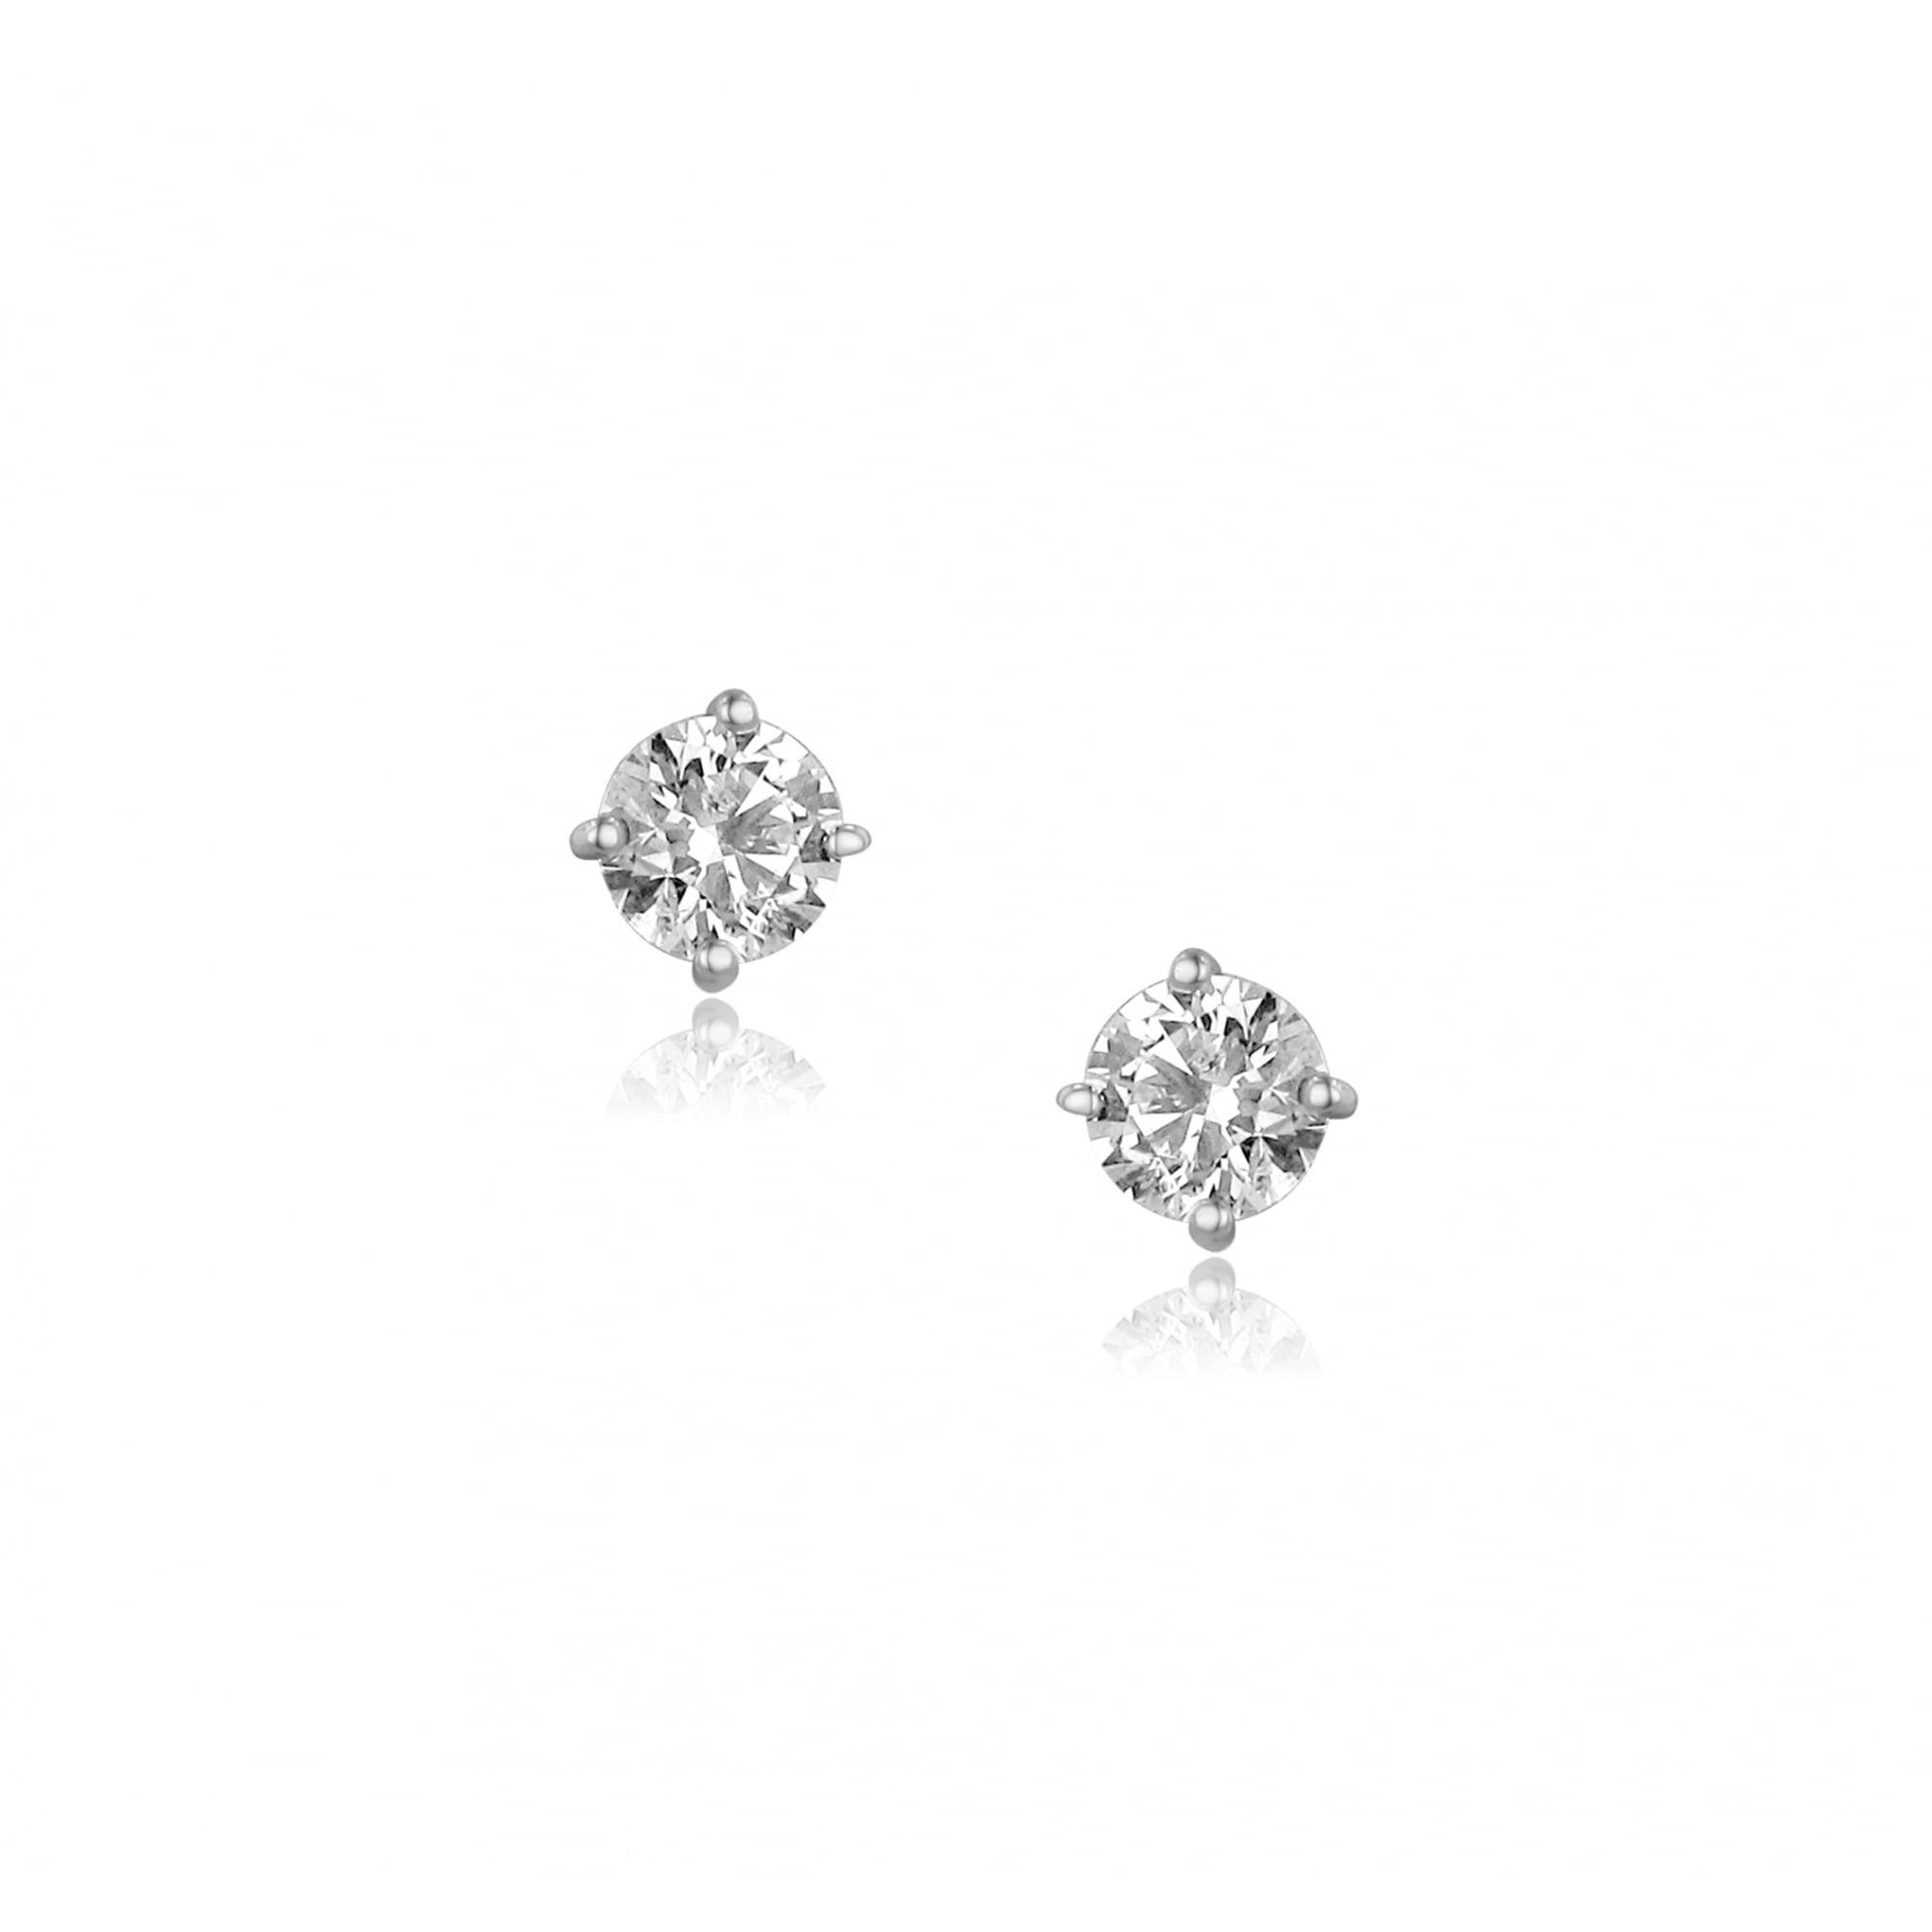 1 25ct Diamond Stud Earrings In 18ct White Gold Womens From Avanti